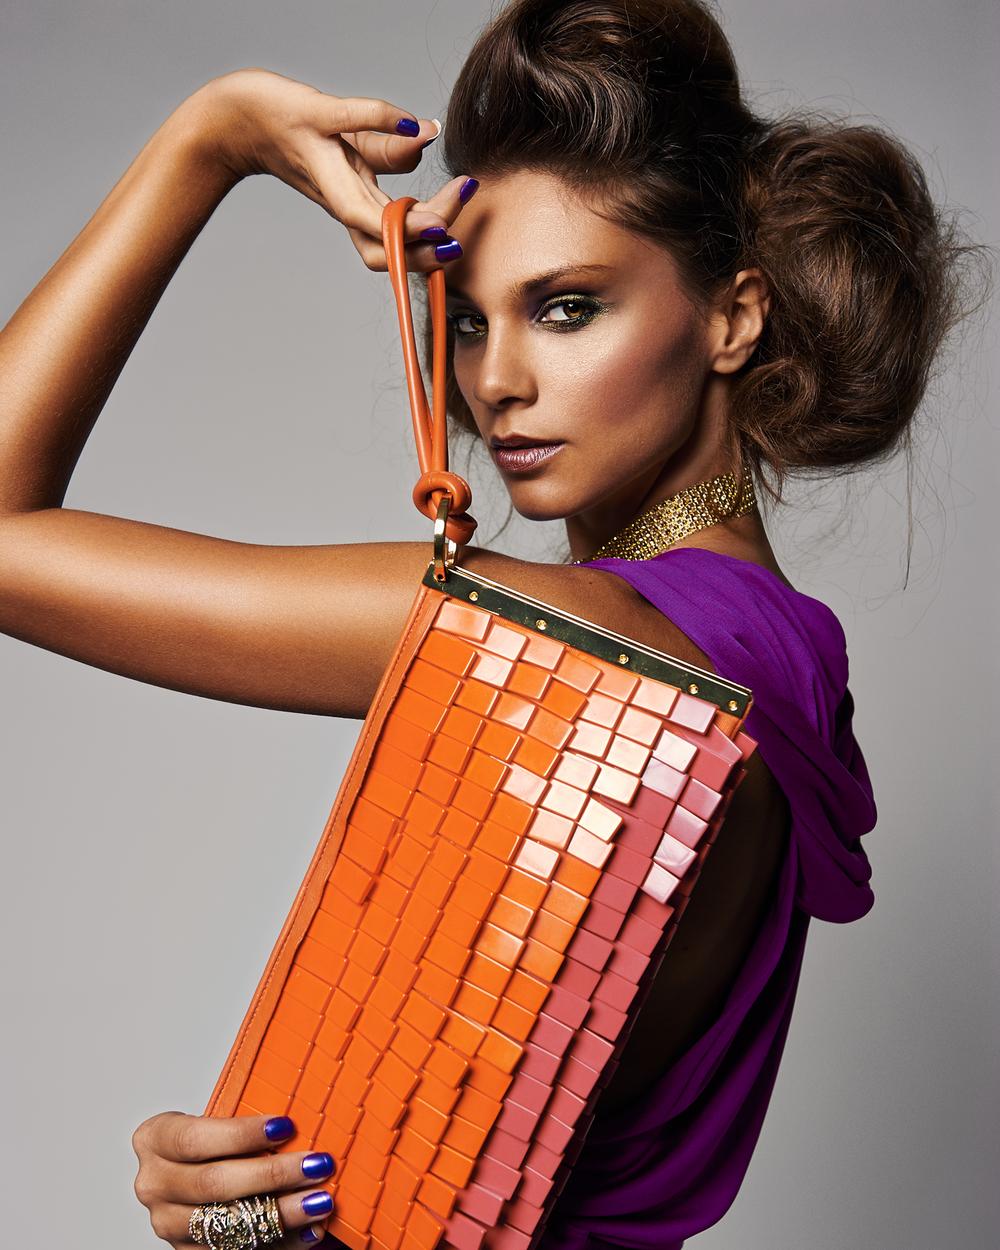 BRAZILIAN RETRO by Antonio Martez   Fashion & Beauty Photographer   New York